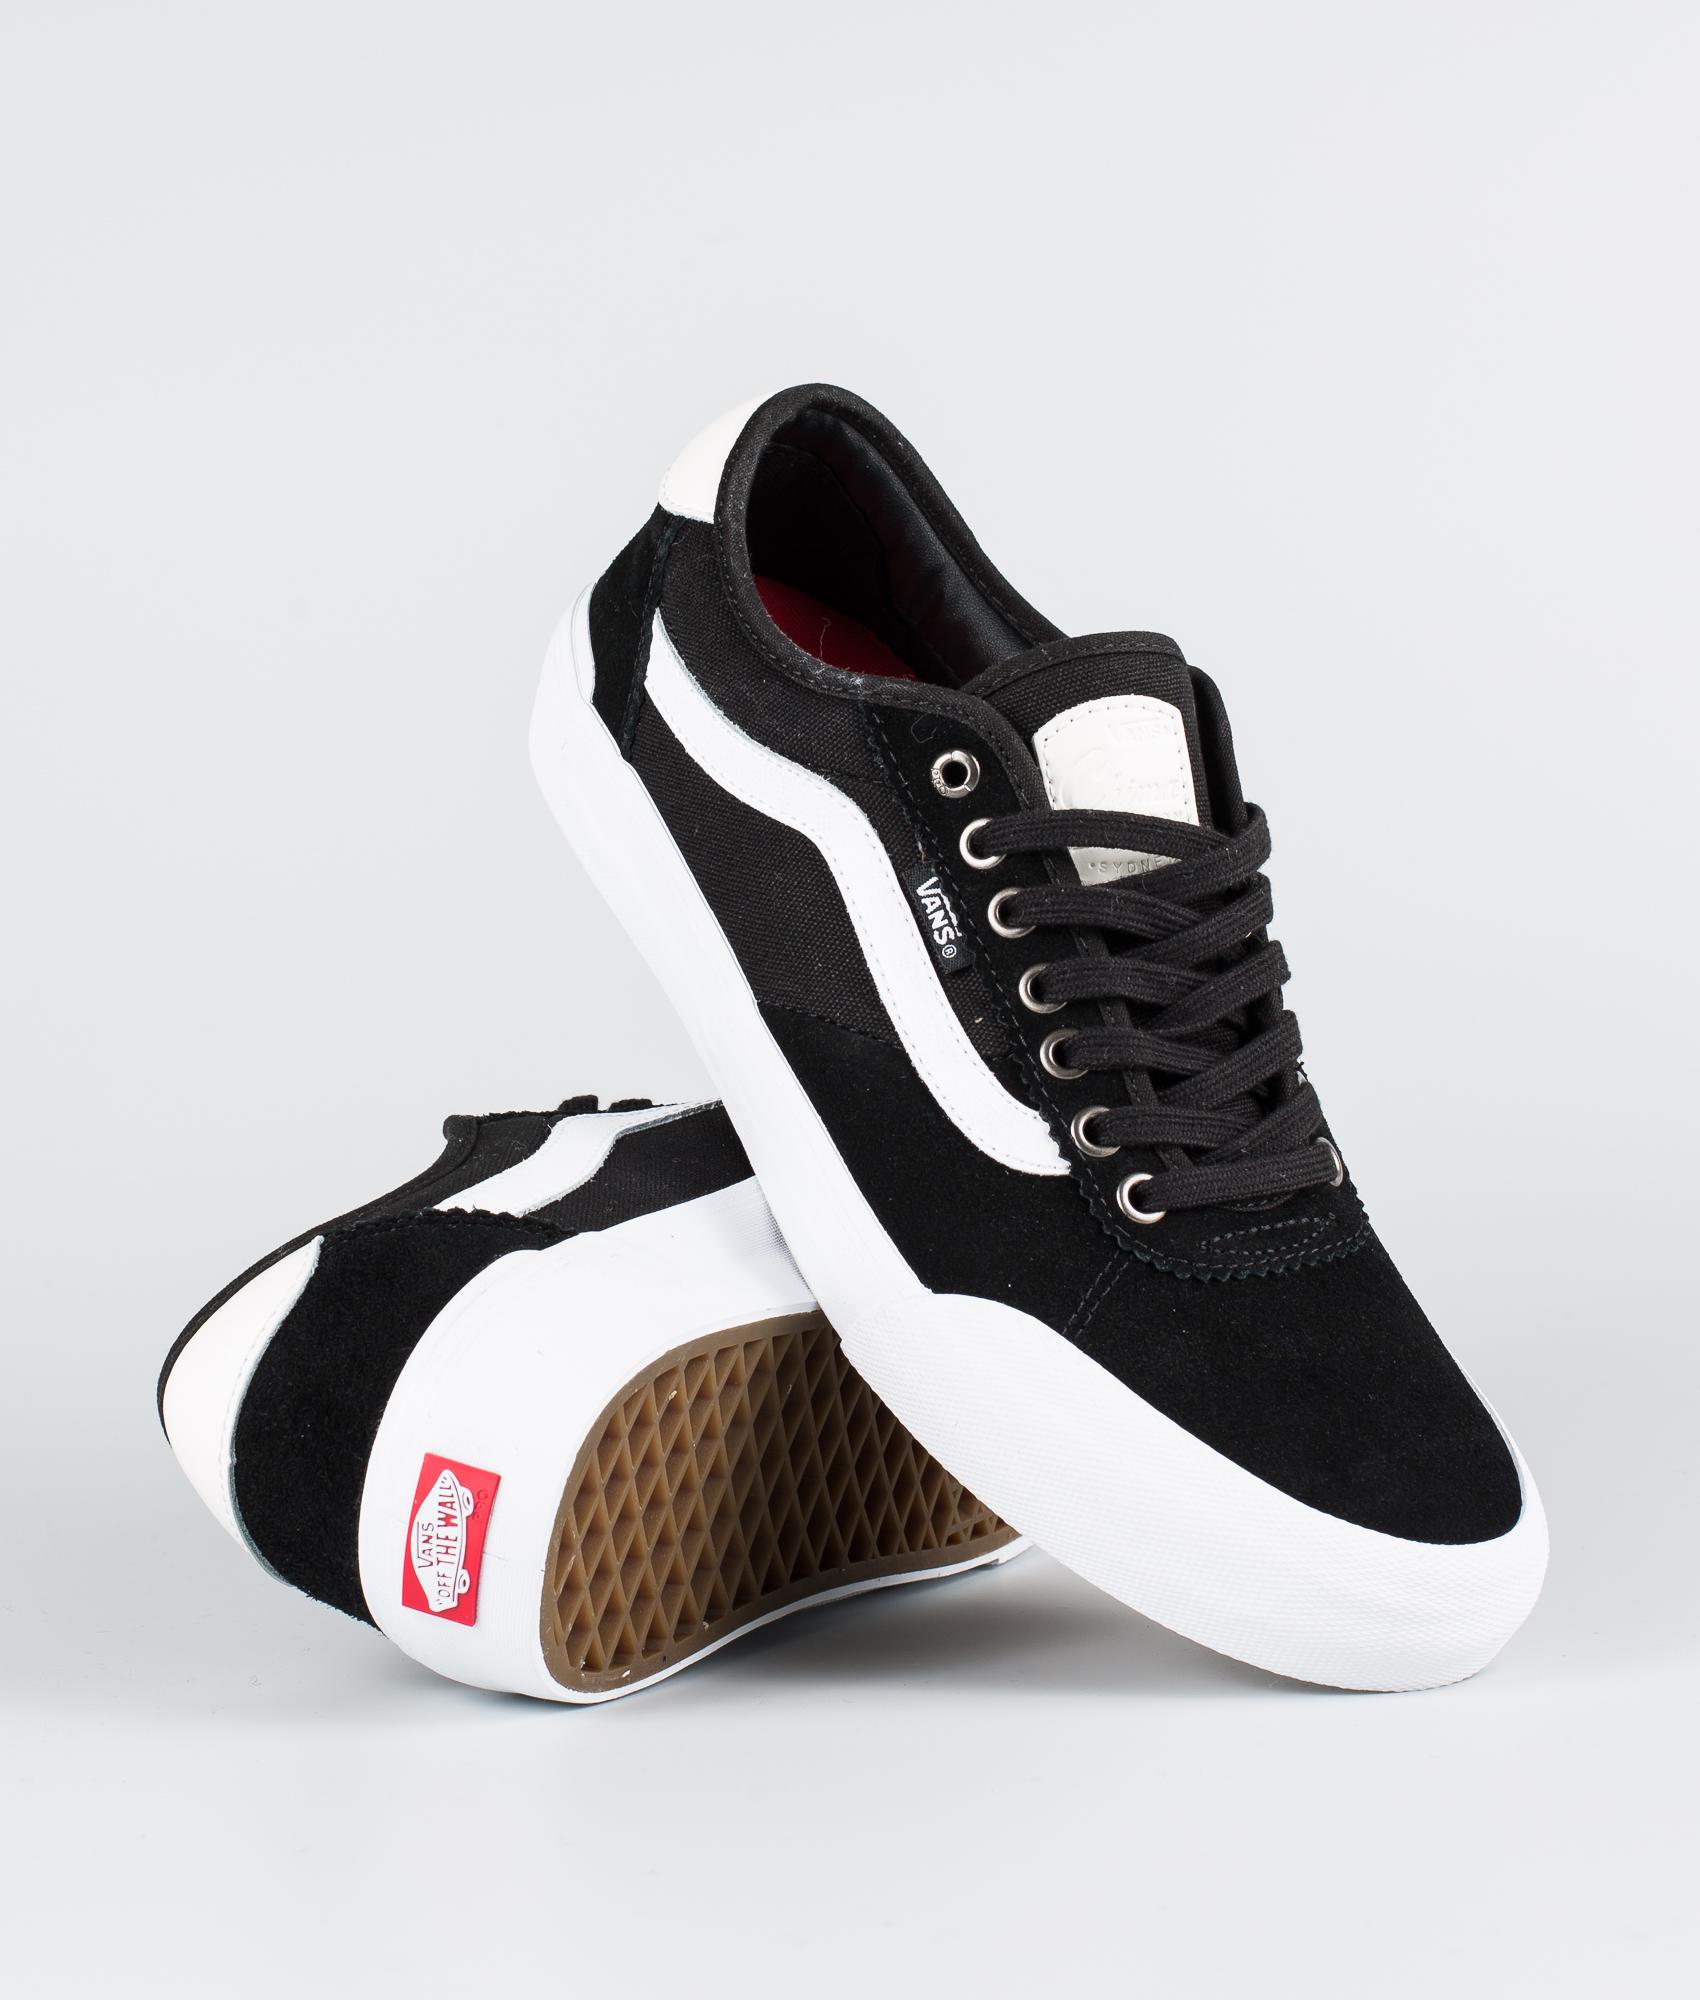 Chima Chaussuressuedecanvas Vans Pro 2 blackwhite eH2WE9IYD